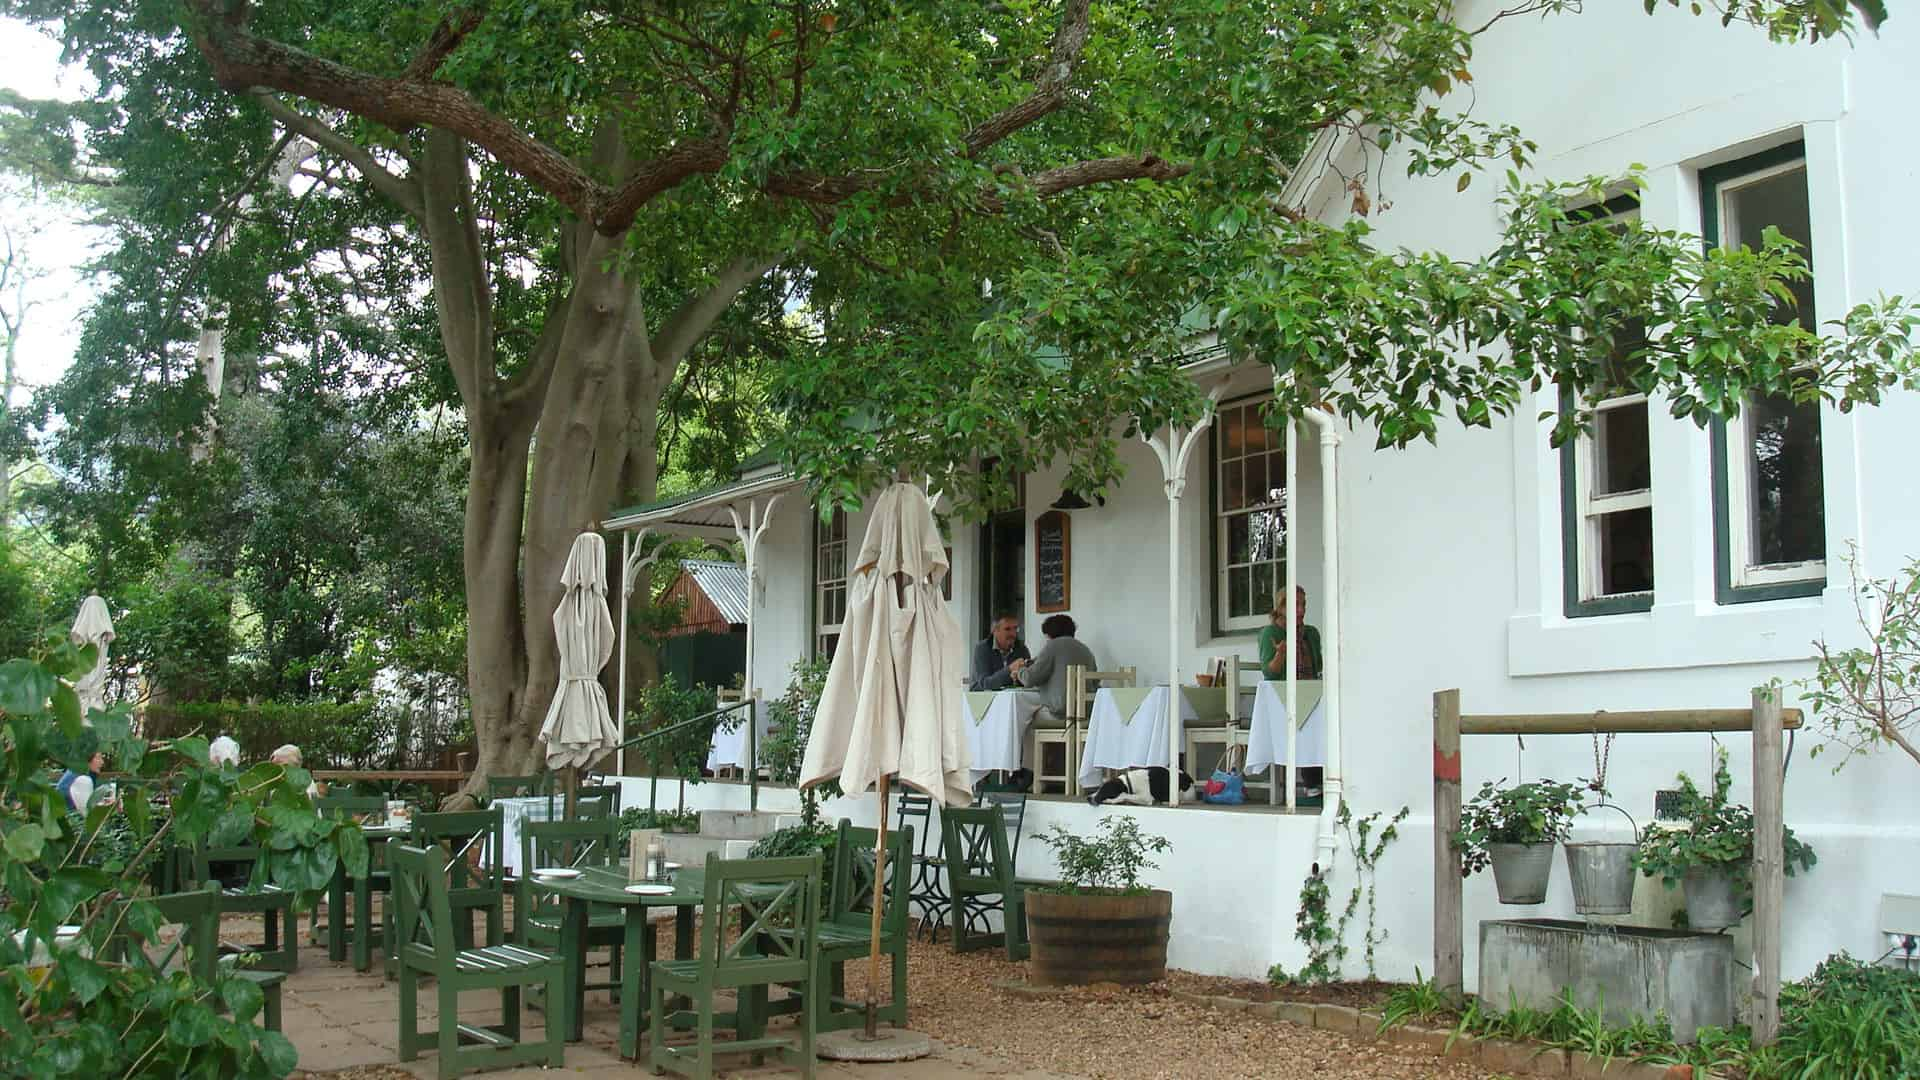 The Gardeners Cottage Restaurant